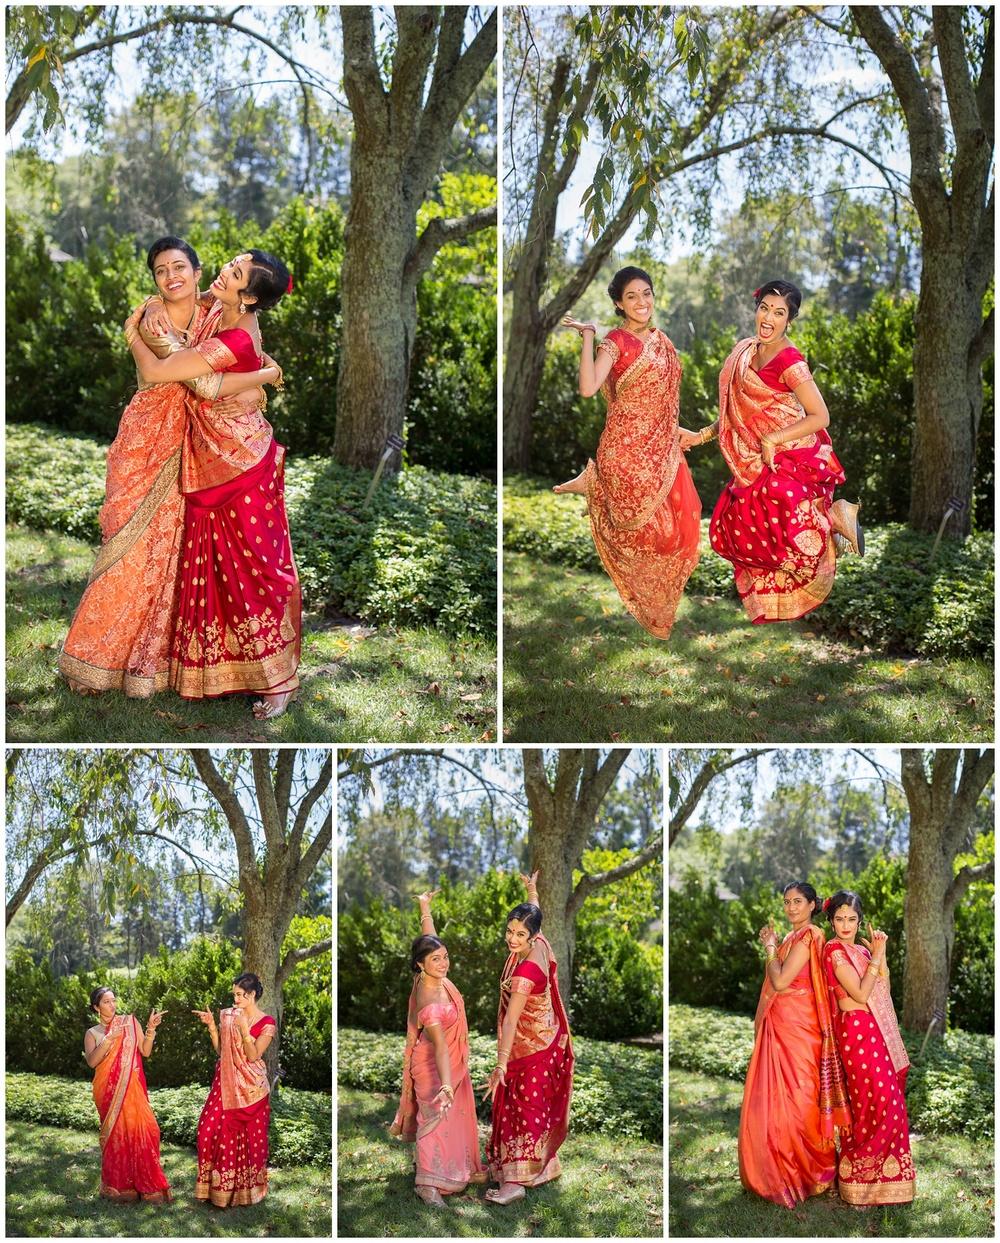 NC-Indian-Wedding-Photographers-025.JPG